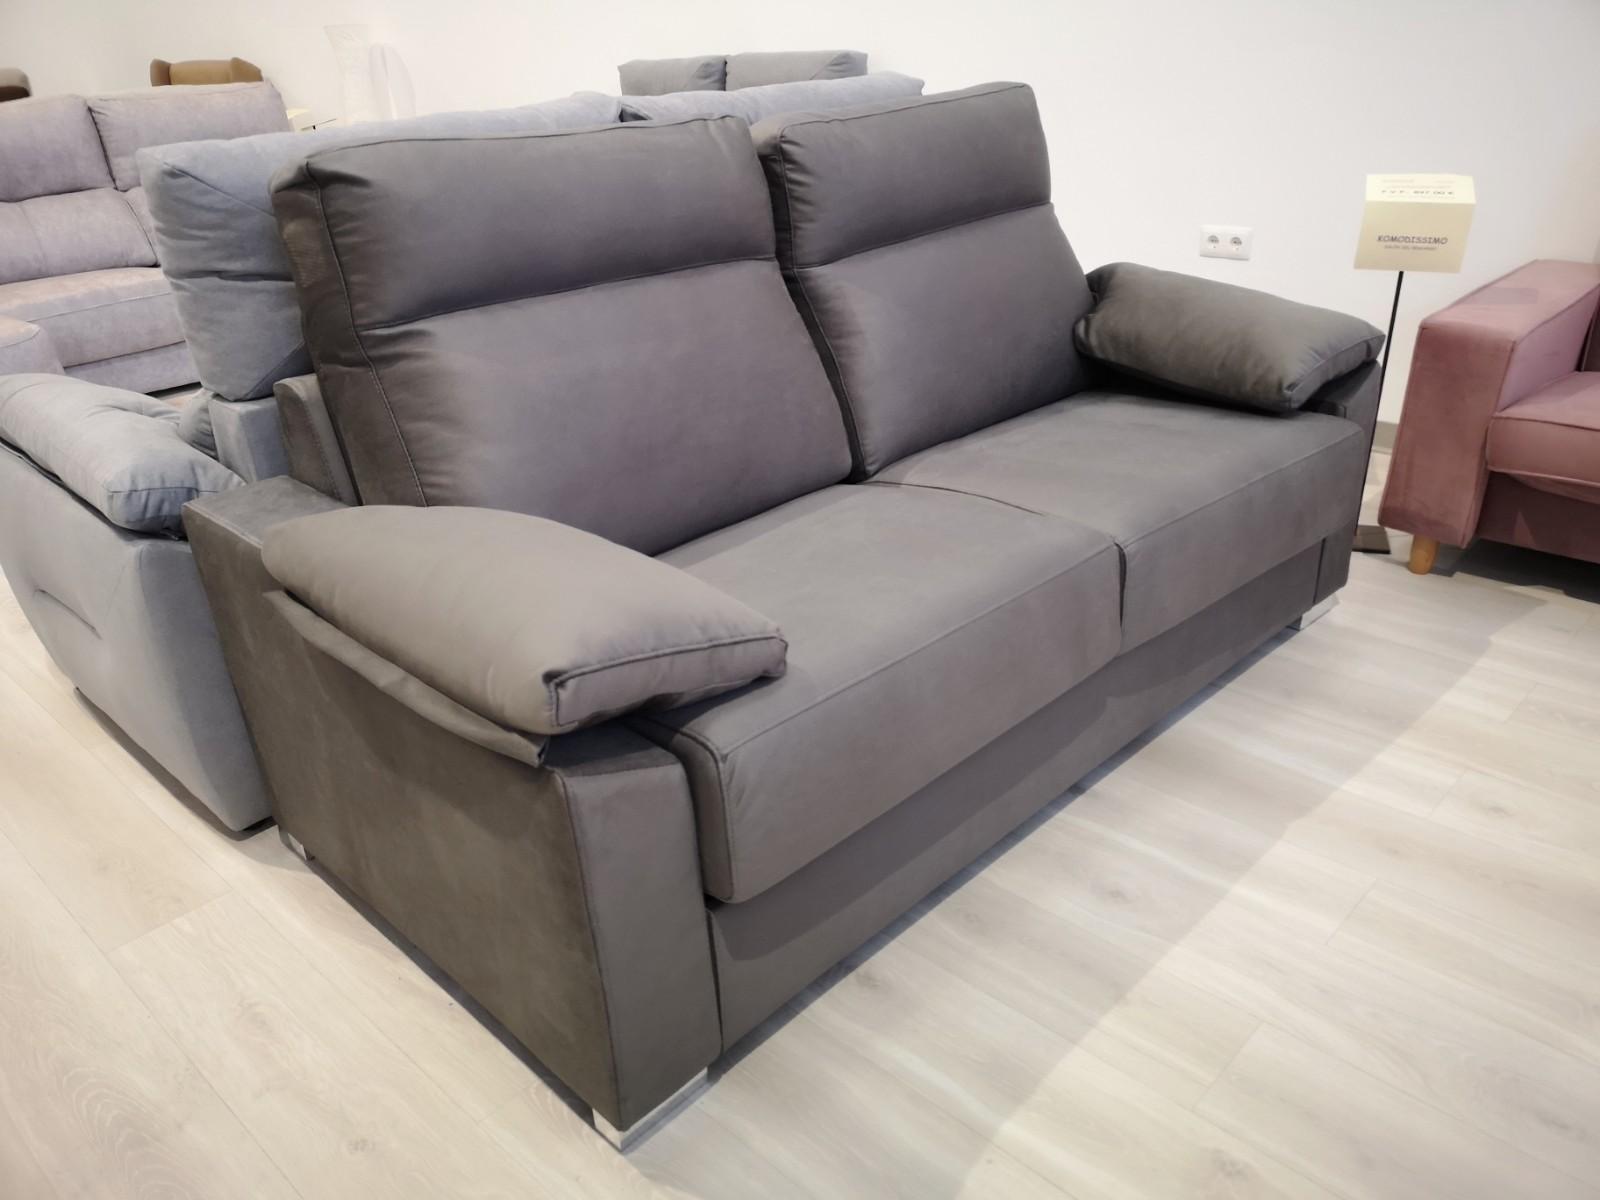 sofá komodissimo